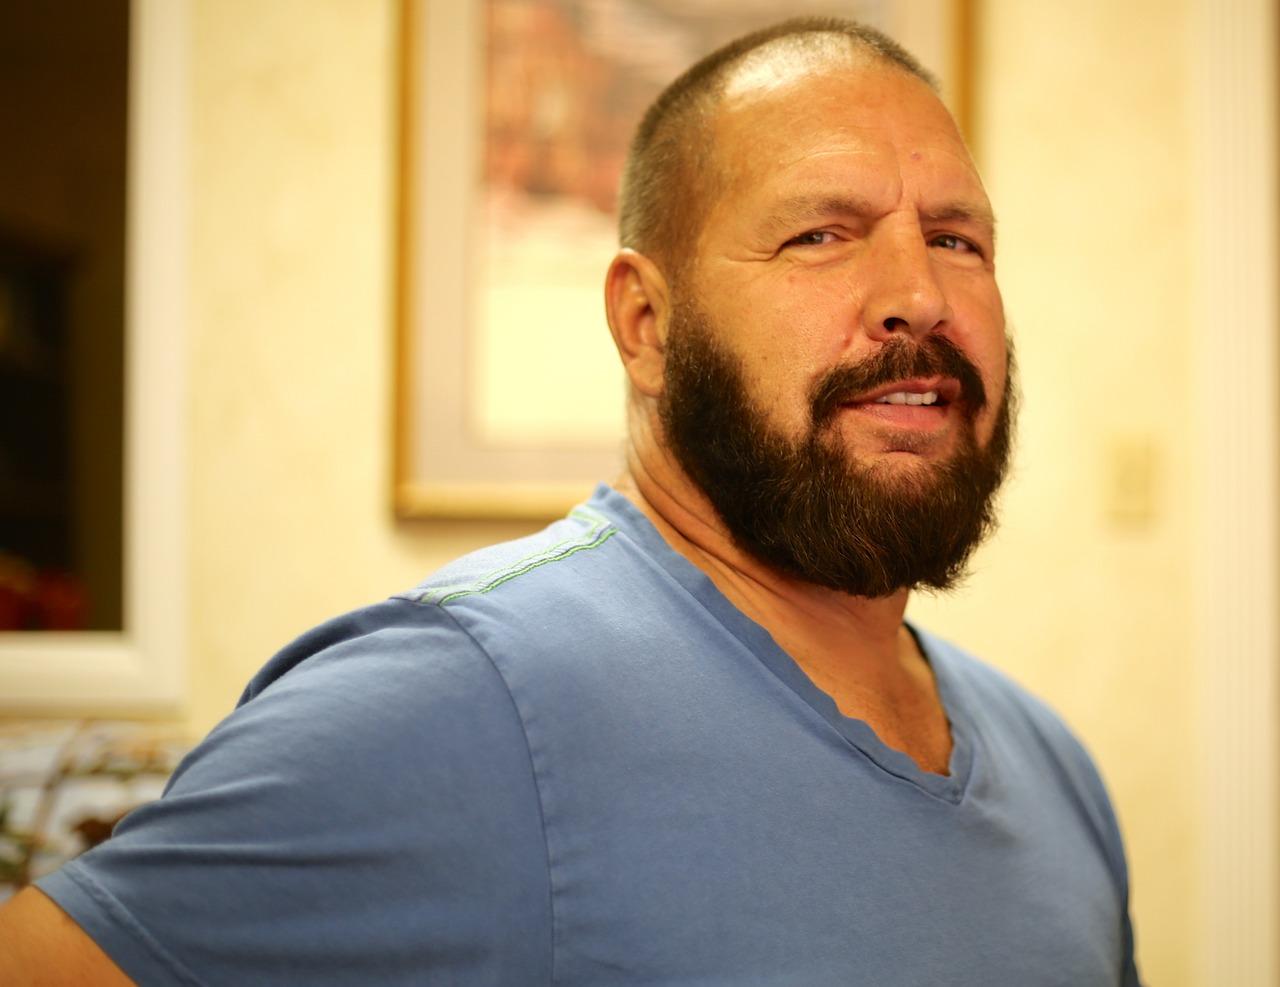 Voller Bart dank Barttransplantation mit Eigenhaar